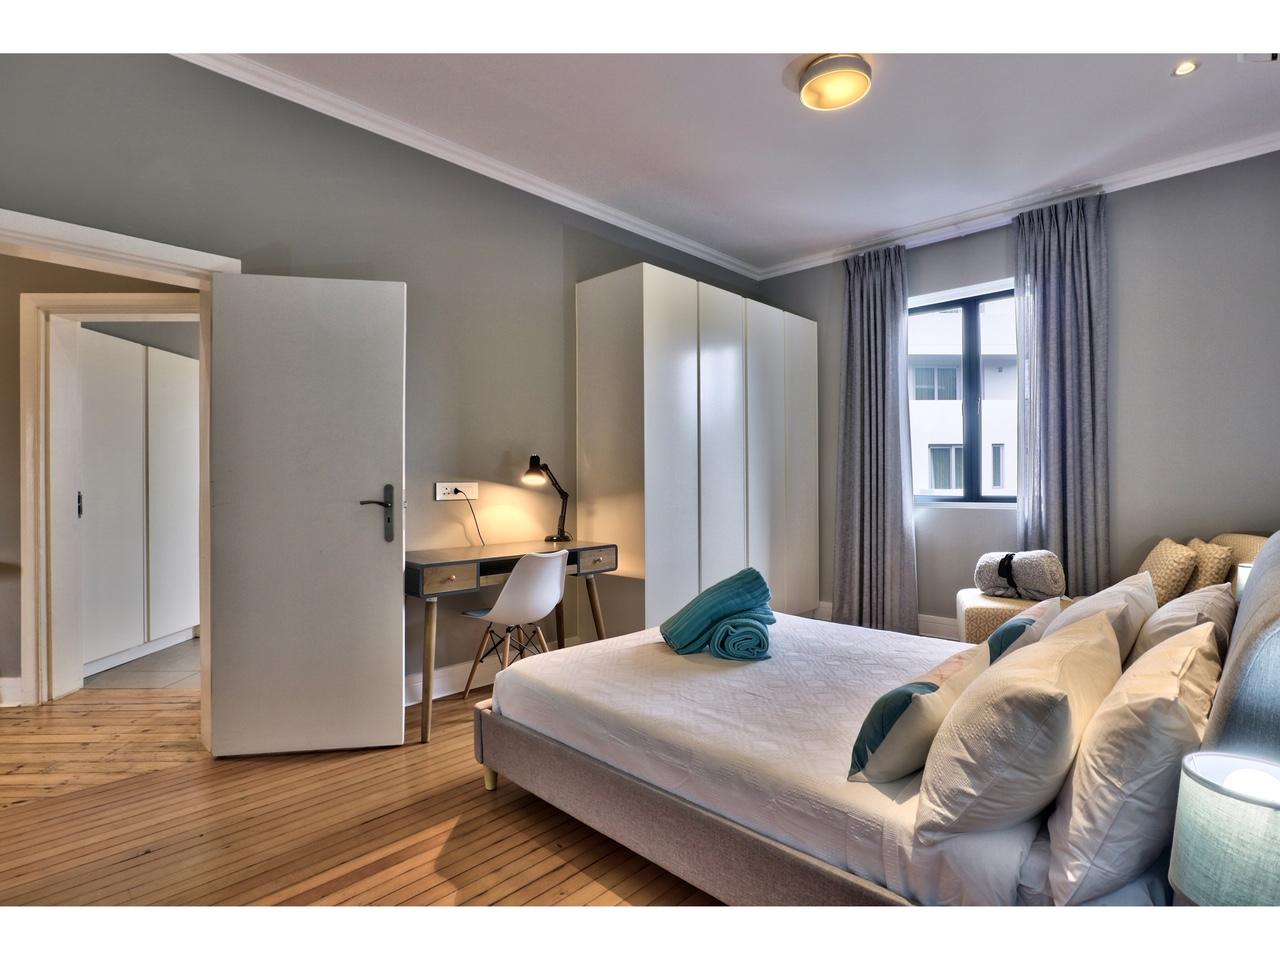 2 Bedroom Greenpoint Shaz Apartment